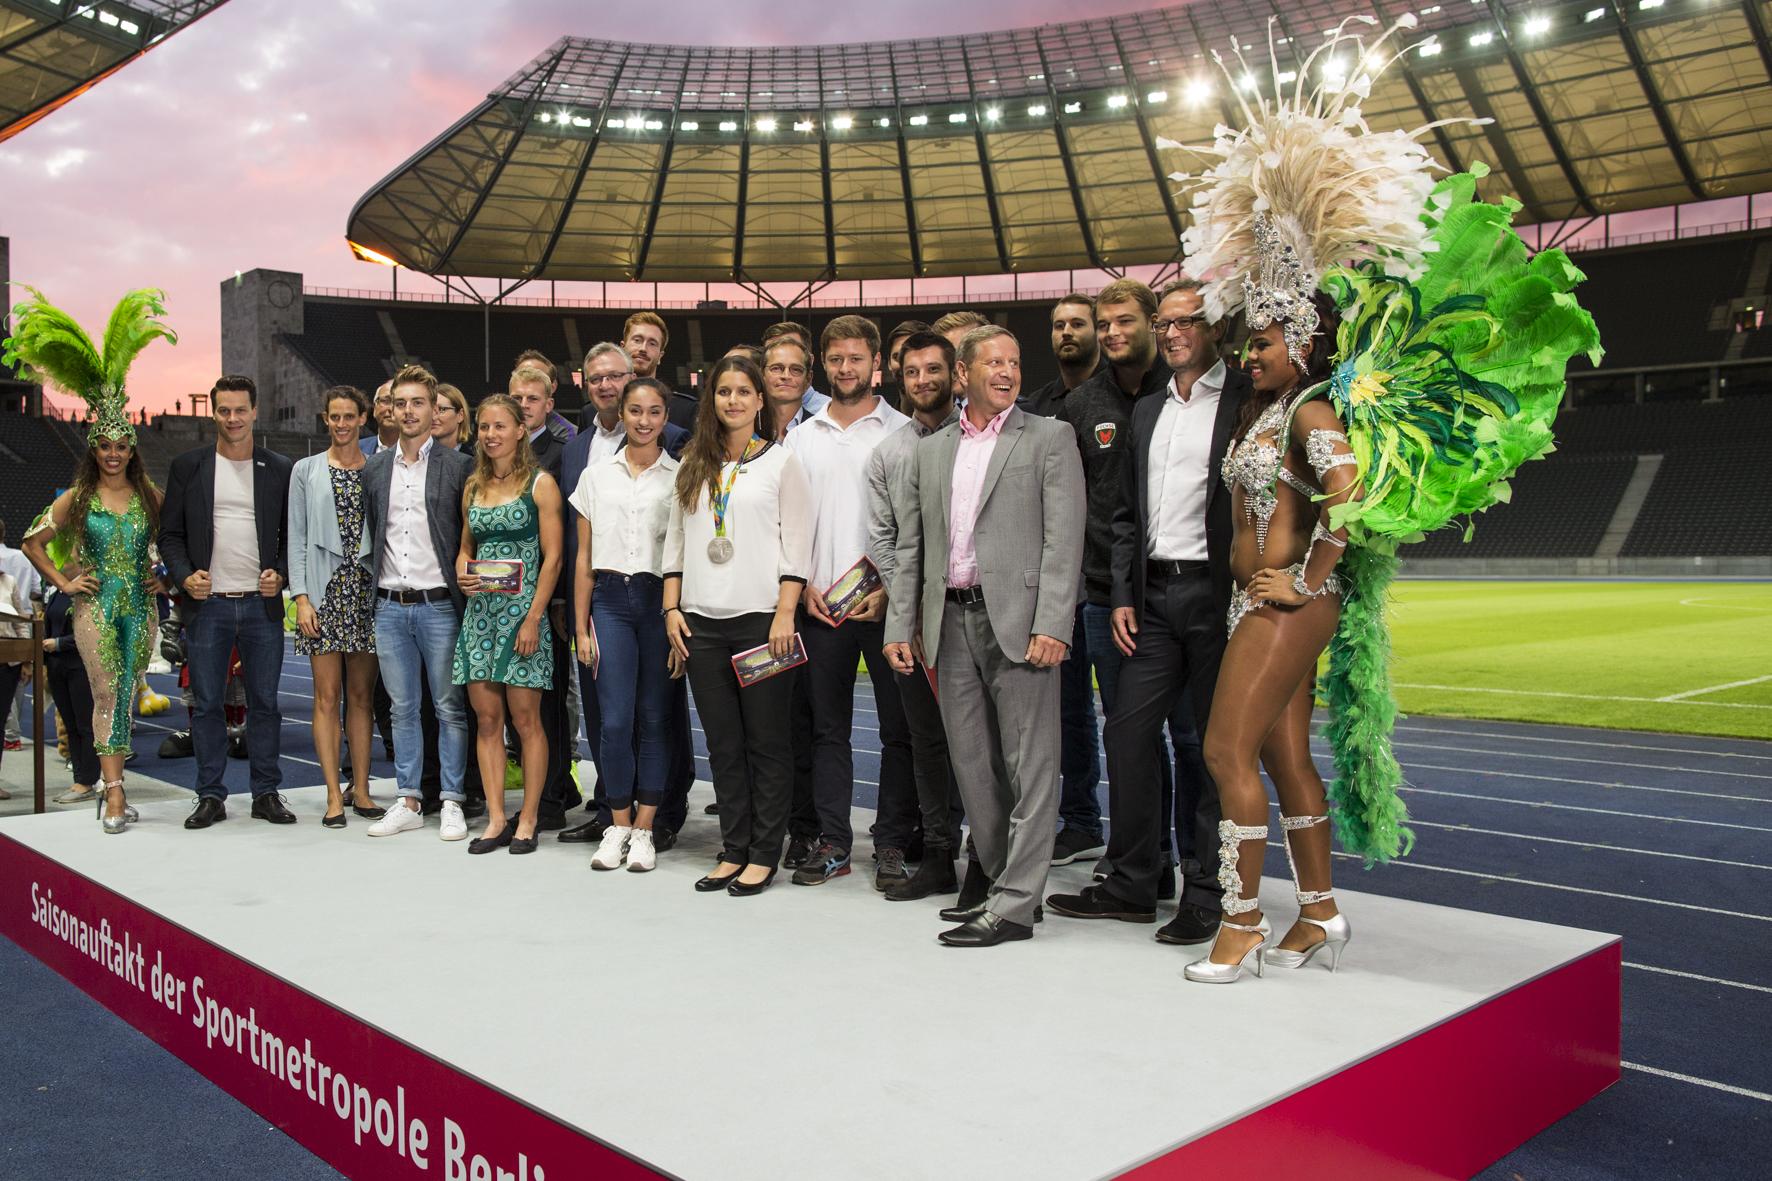 Team Berlin Rio beim Saisonauftakt der Sportmetropole Berlin